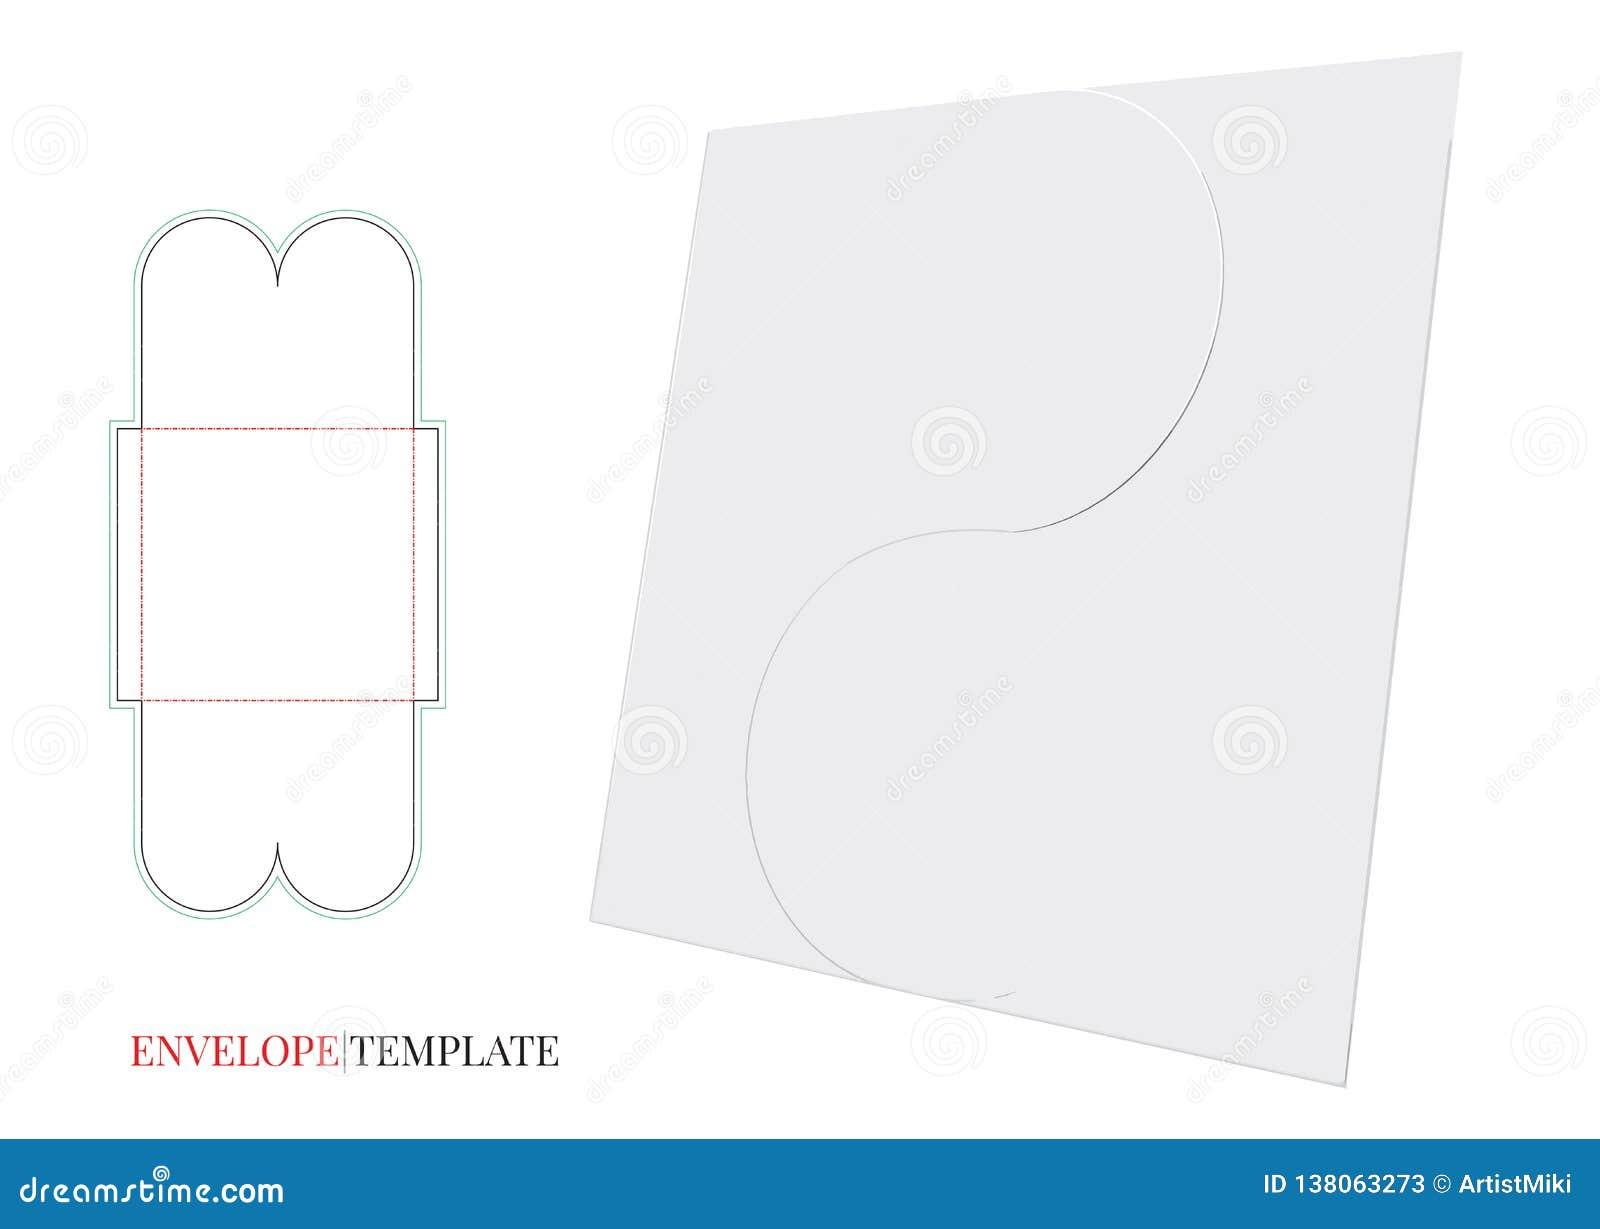 Envelope Template with die line, Vector Envelope Design